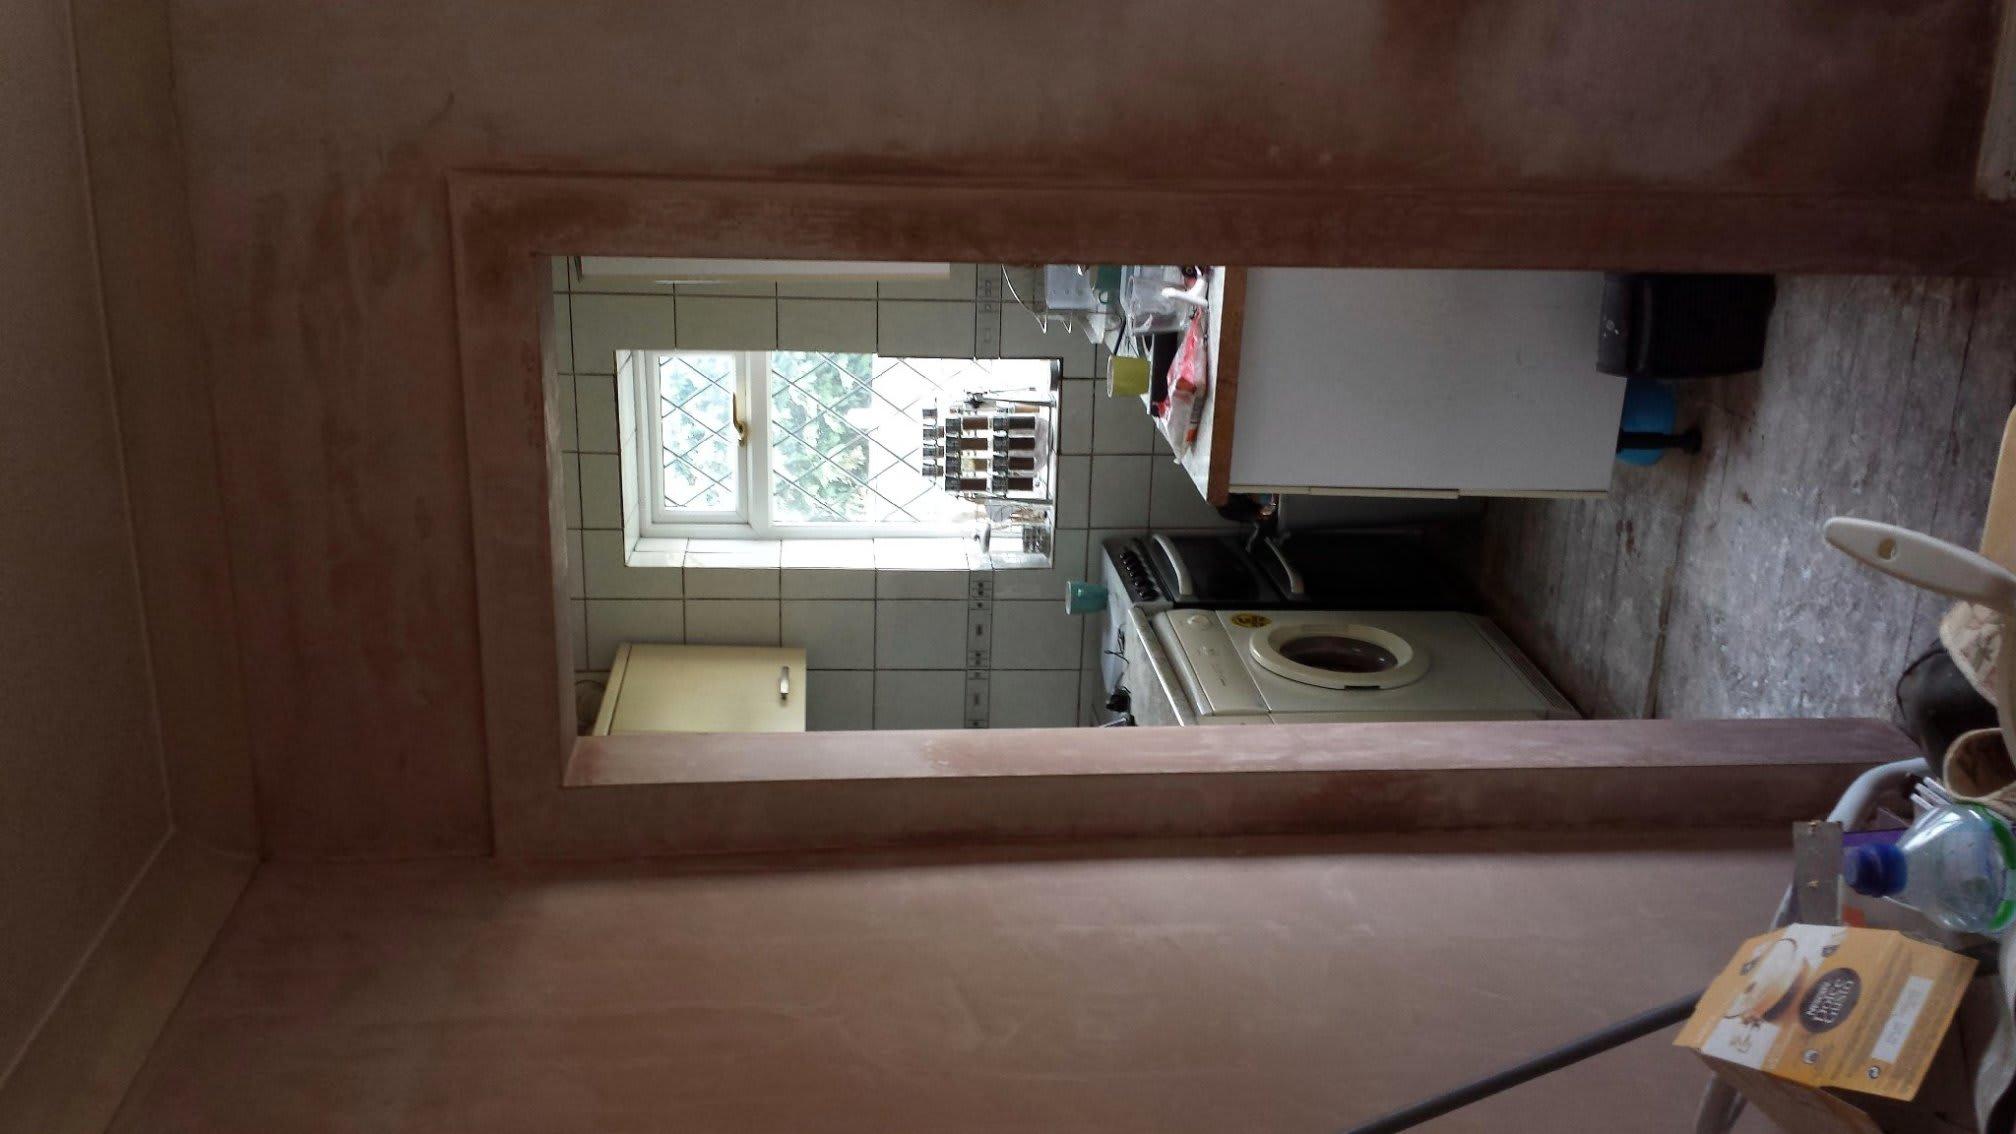 Chris Reed Plastering Of Farnley West Leeds | 2 Havercroft, Leeds LS12 5AB | +44 7967 038894